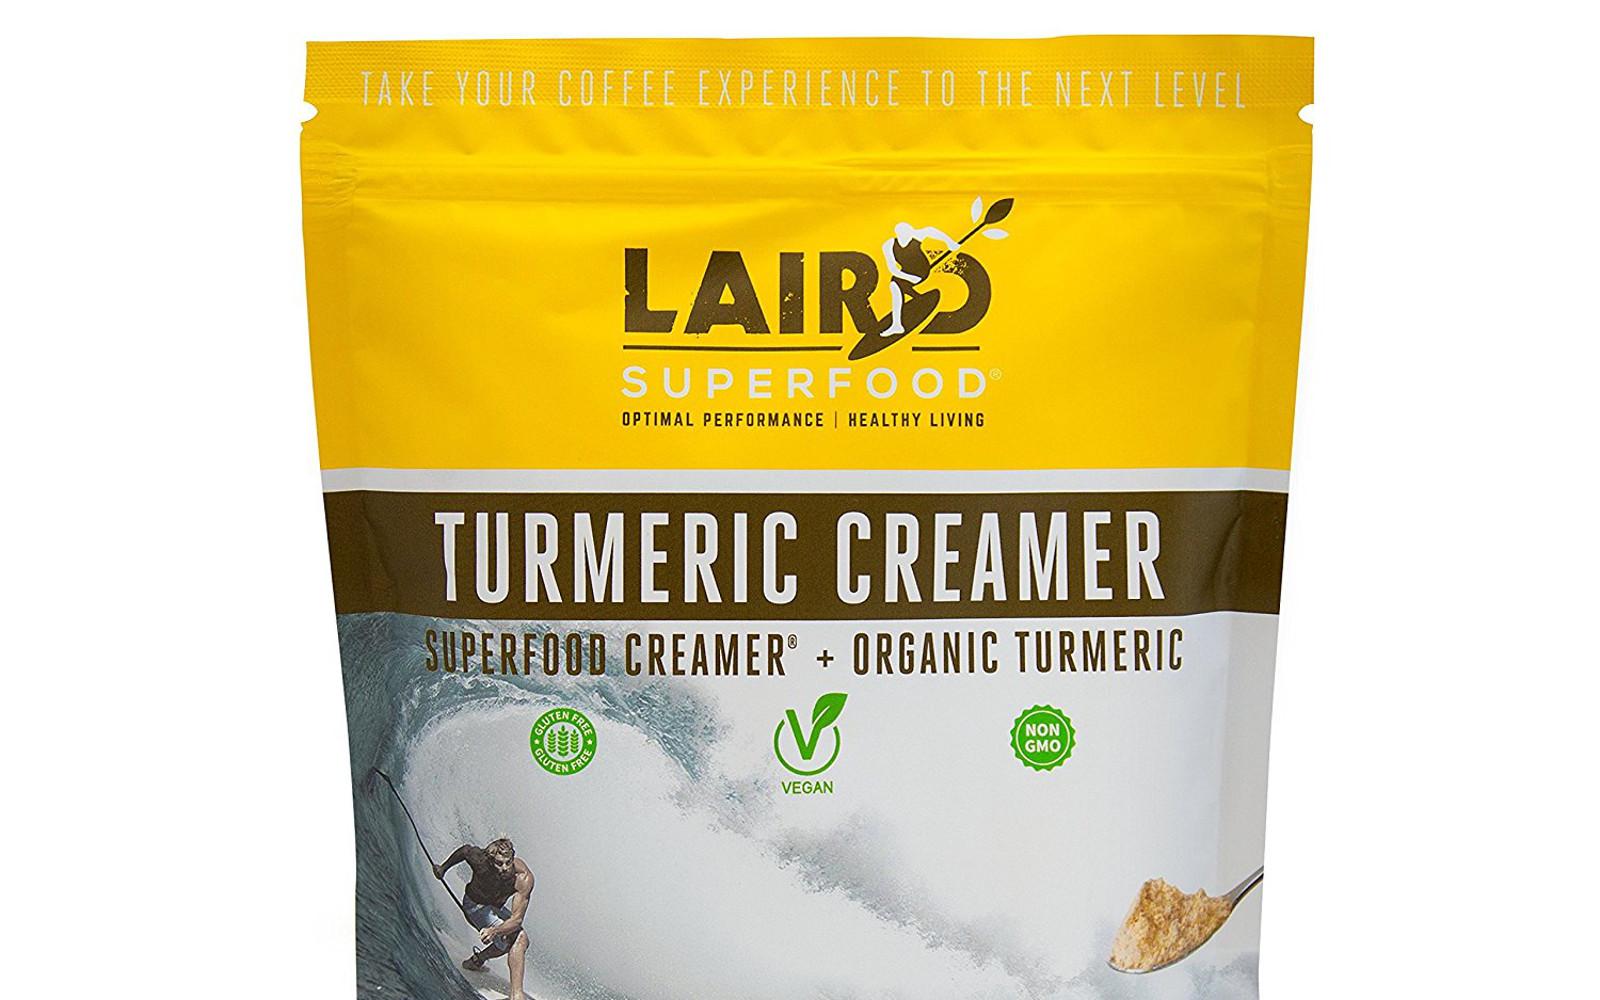 turmeric creamer